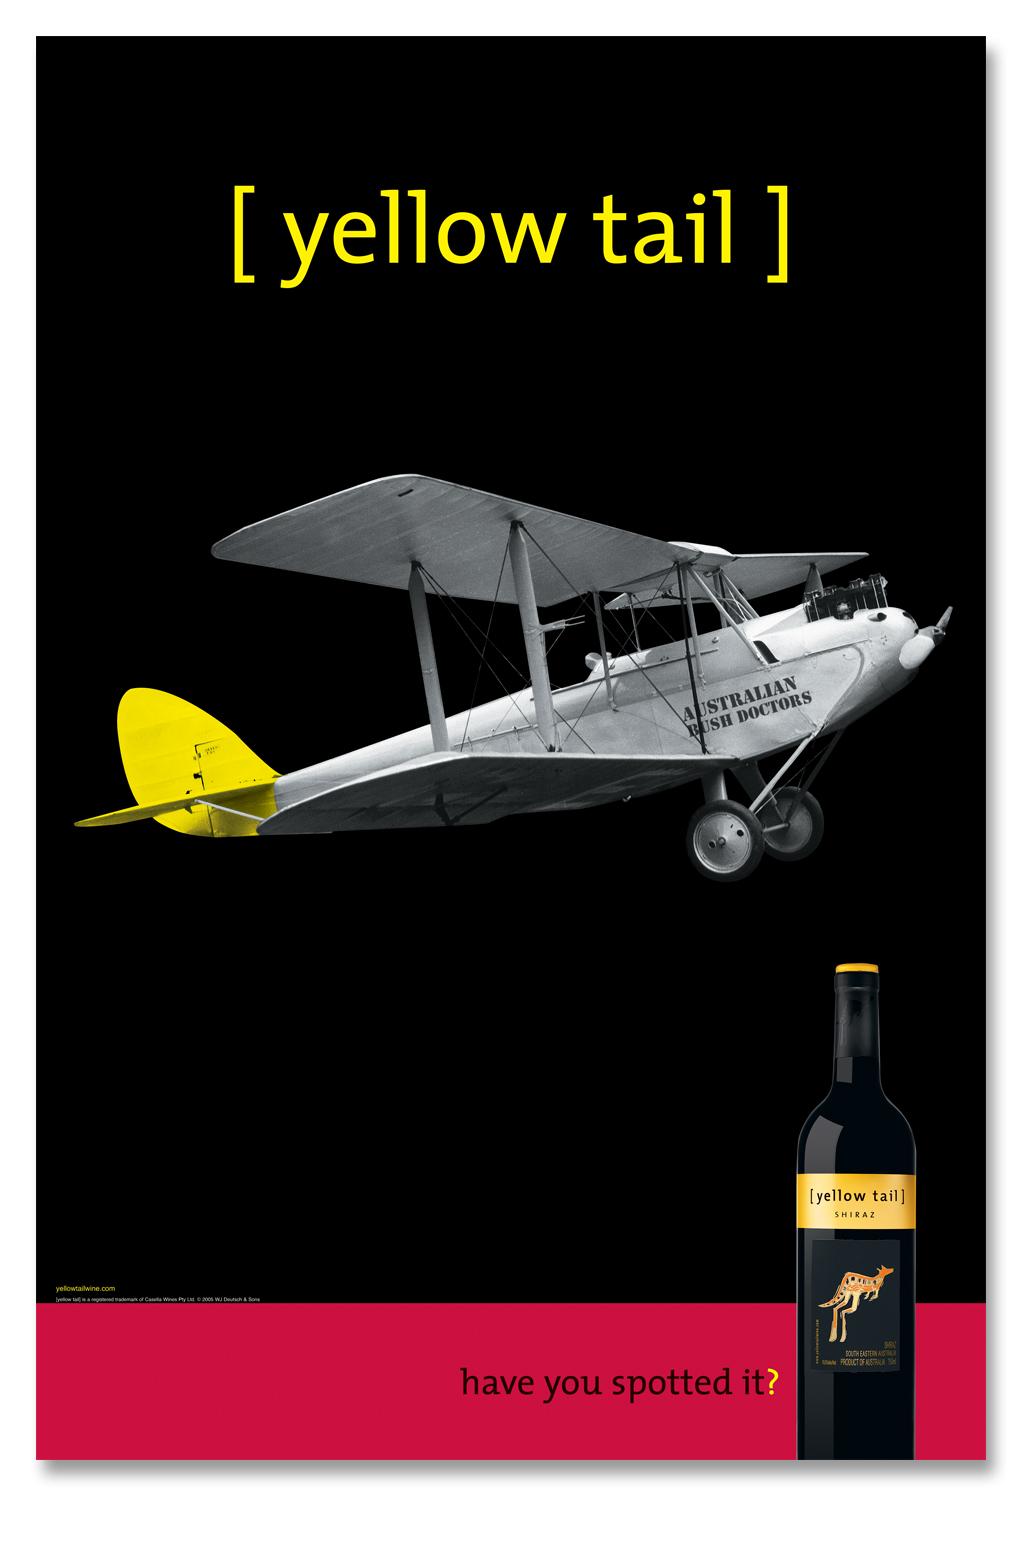 yellowtail_poster_plane.jpg